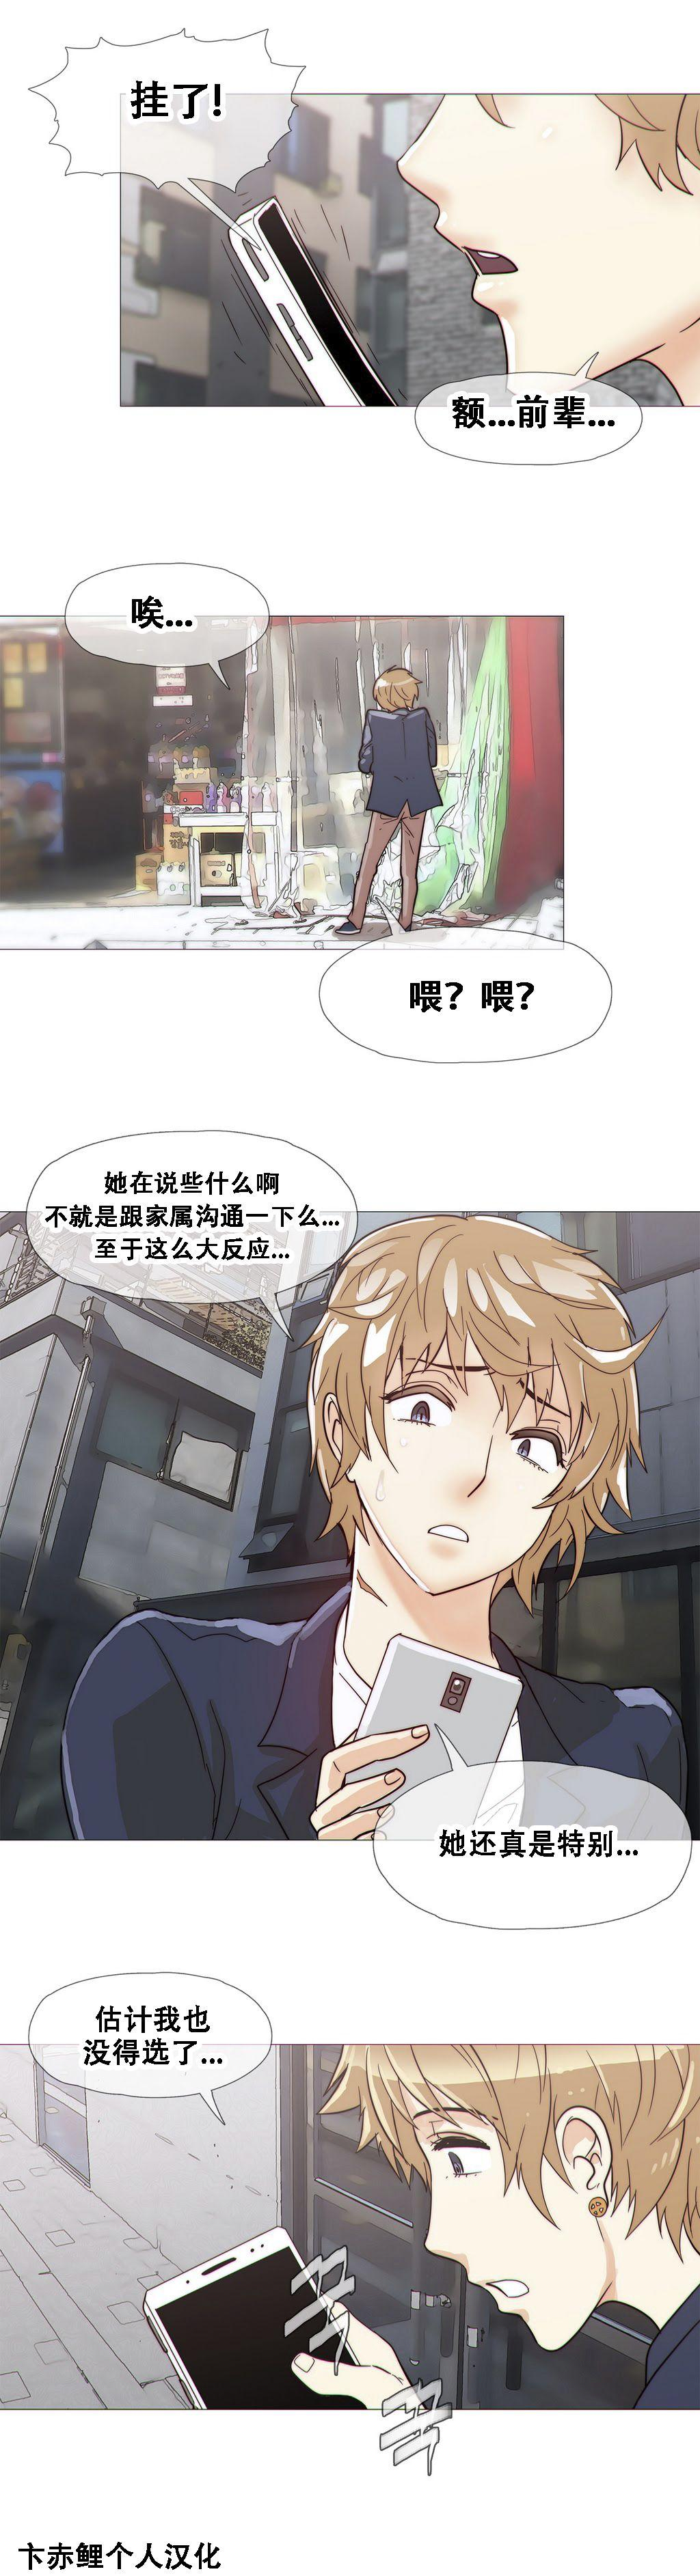 HouseHold Affairs 【卞赤鲤个人汉化】1~33话(持续更新中) 411